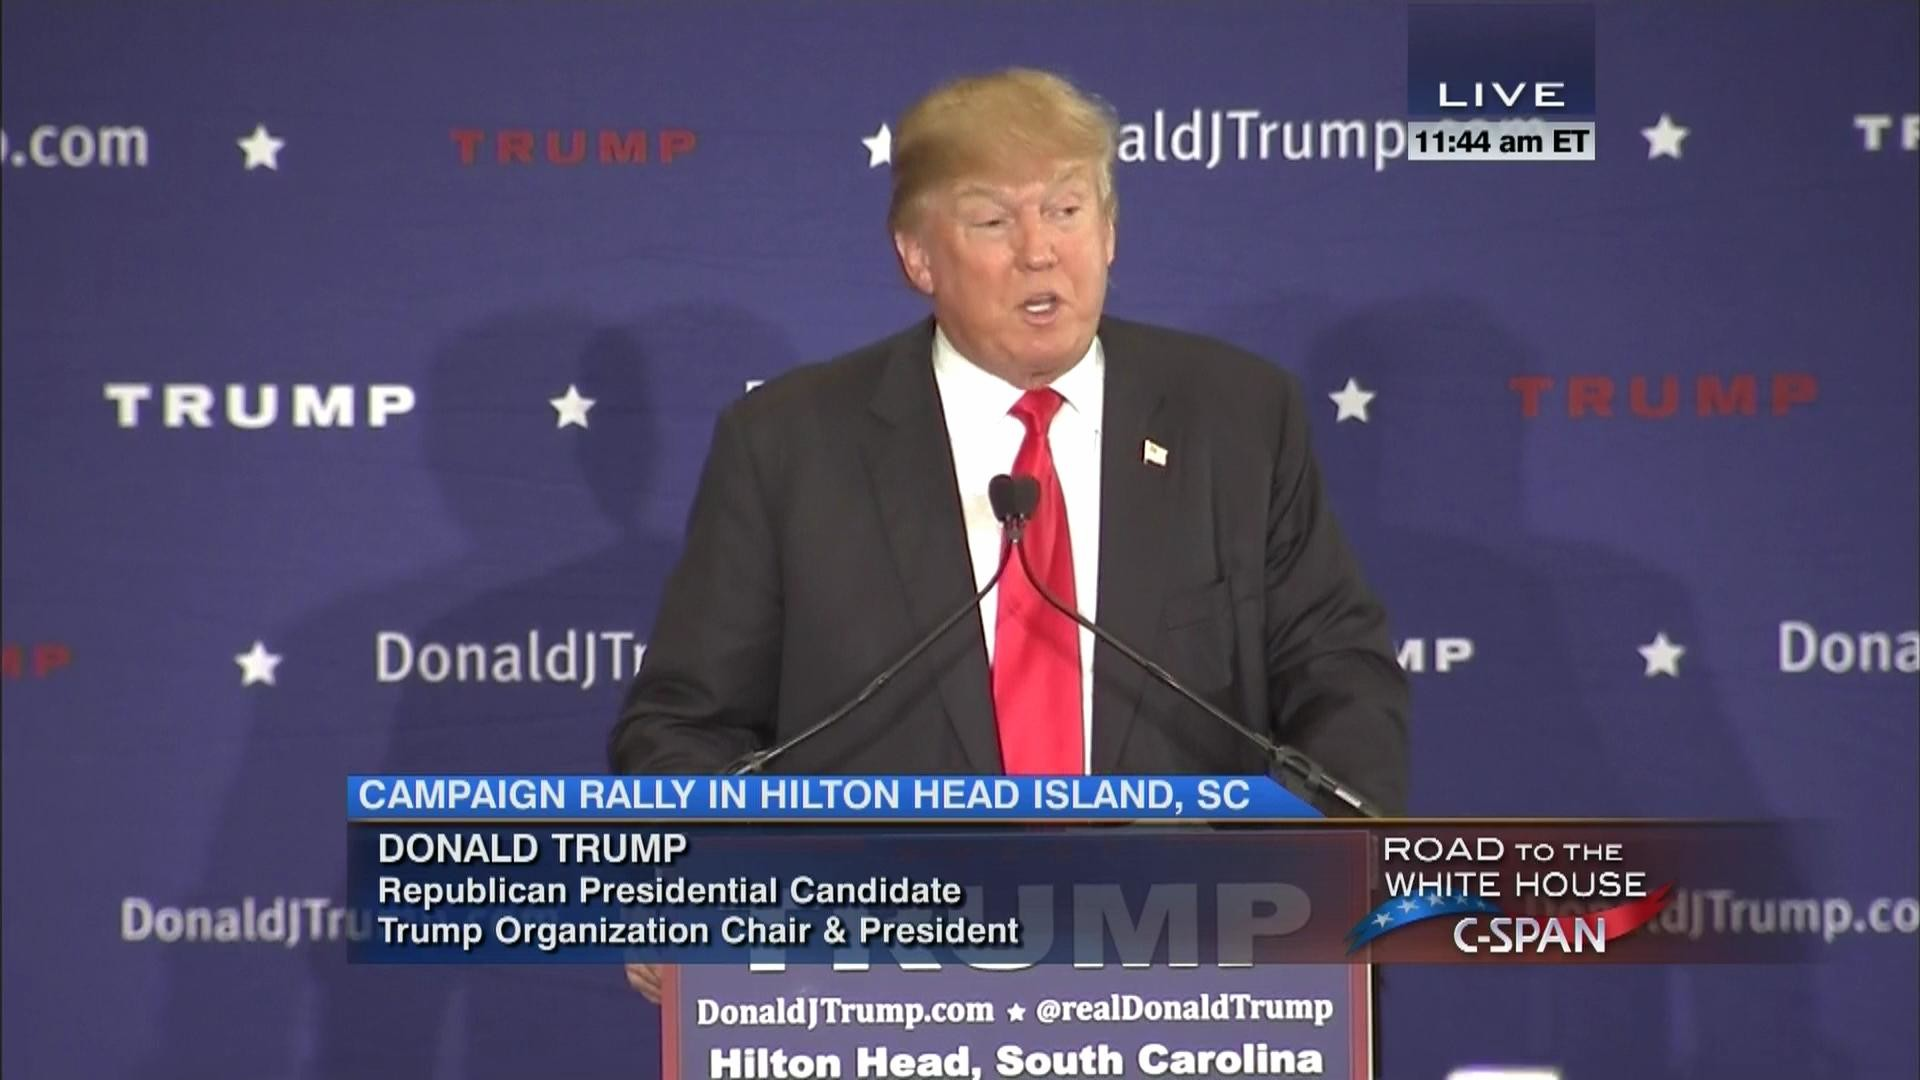 Donald Trump Campaign Rally Hilton Head South Carolina, Dec 30 2015 |  C-SPAN.org